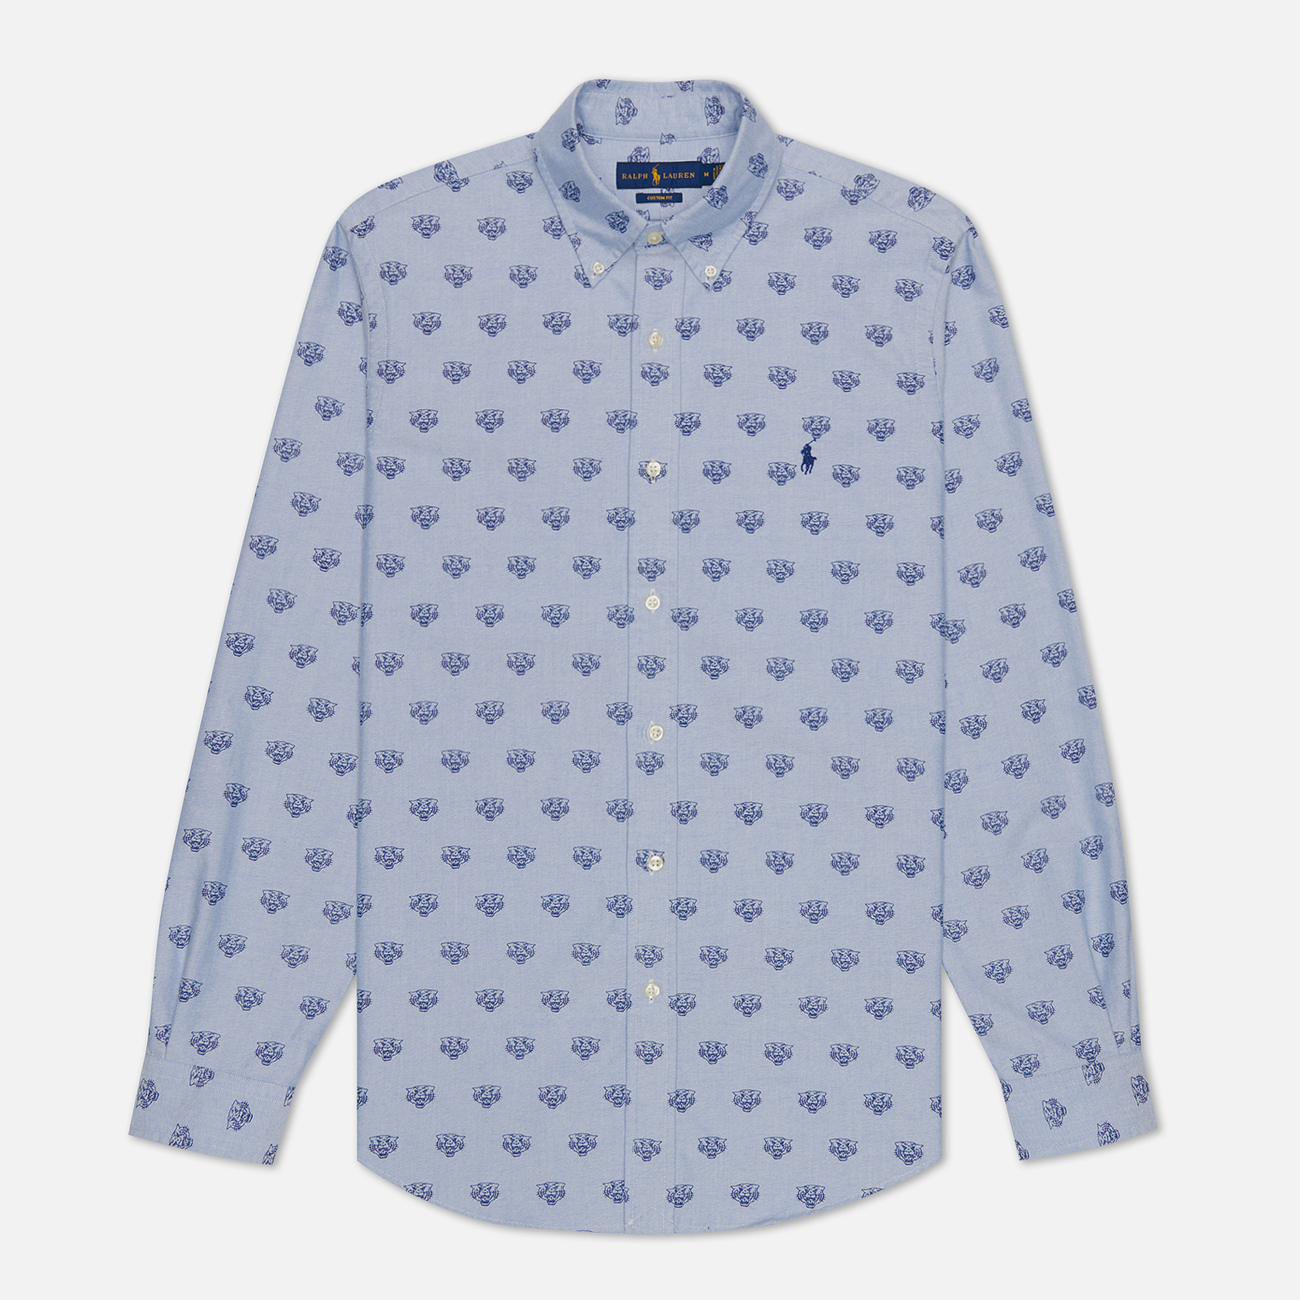 Мужская рубашка Polo Ralph Lauren Custom Fit Polo Pony Color Printed Oxford Collegiate Tigers